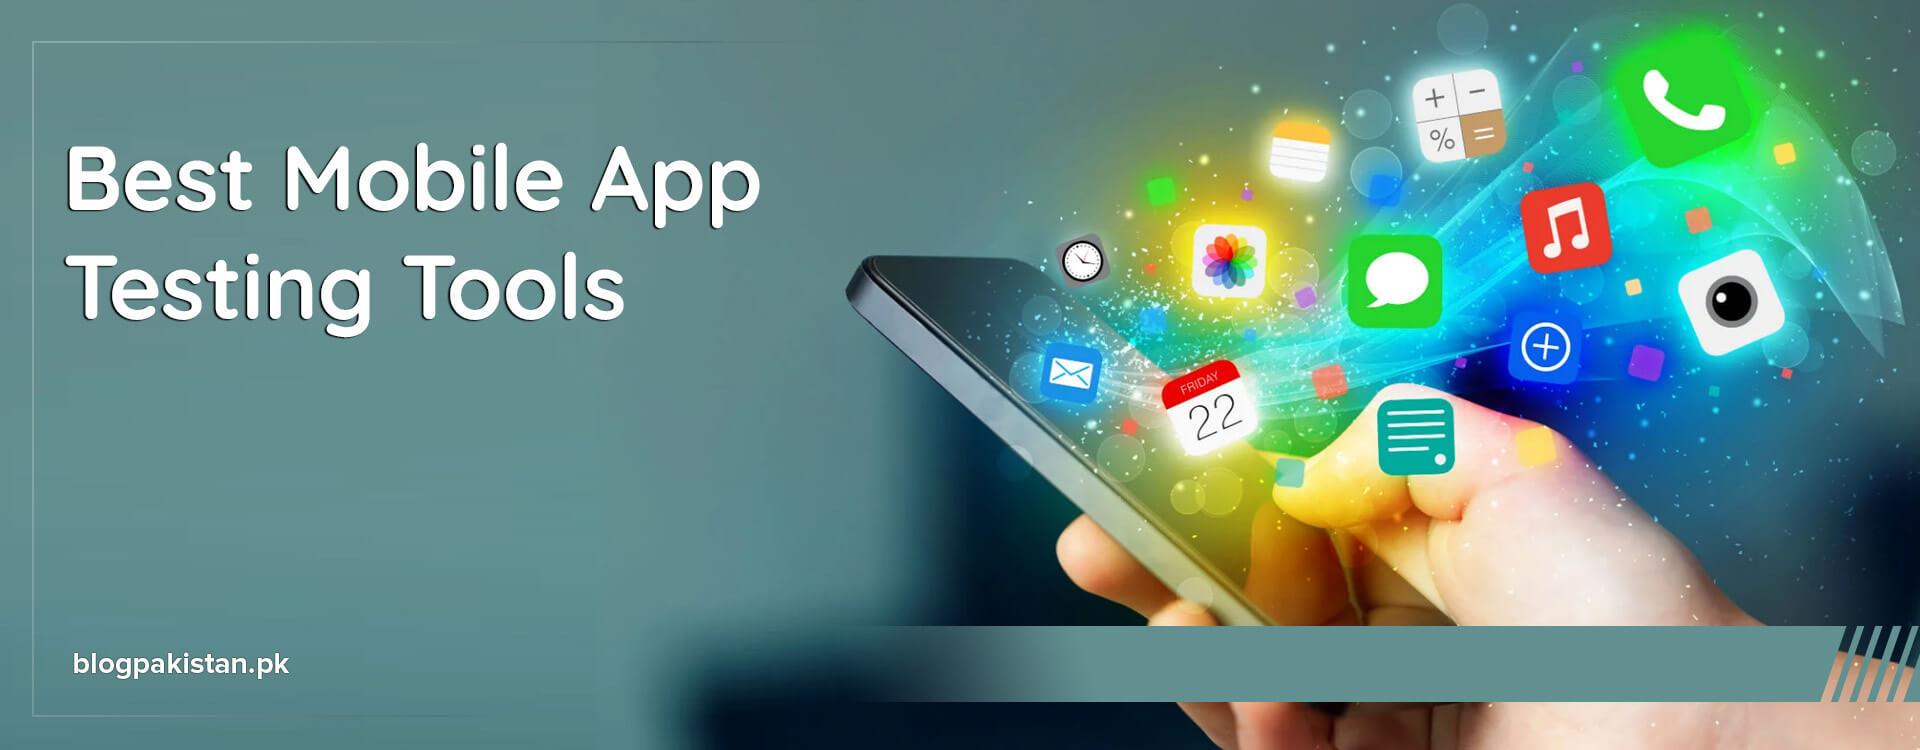 best mobile app testing tools